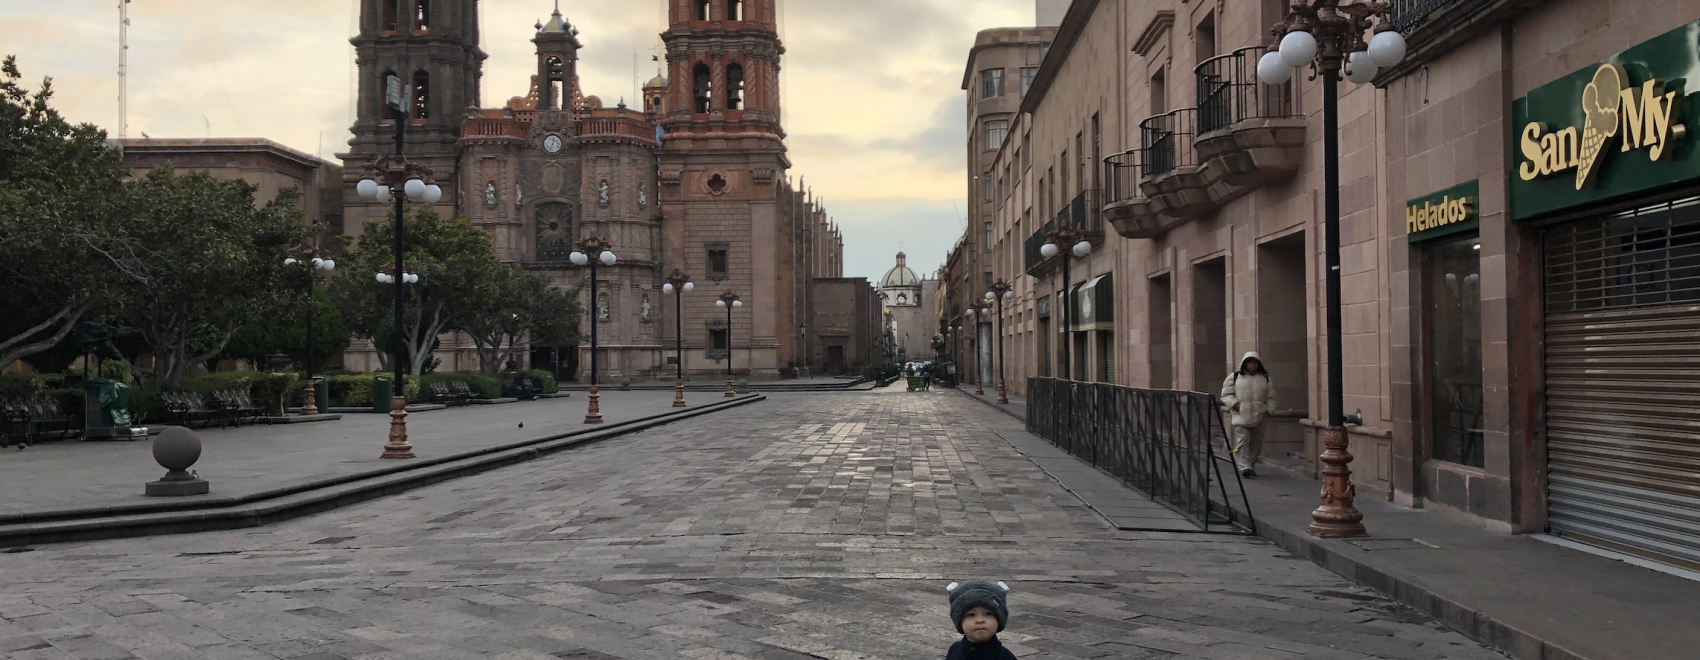 Traveling With a Toddler San Luis Potosi